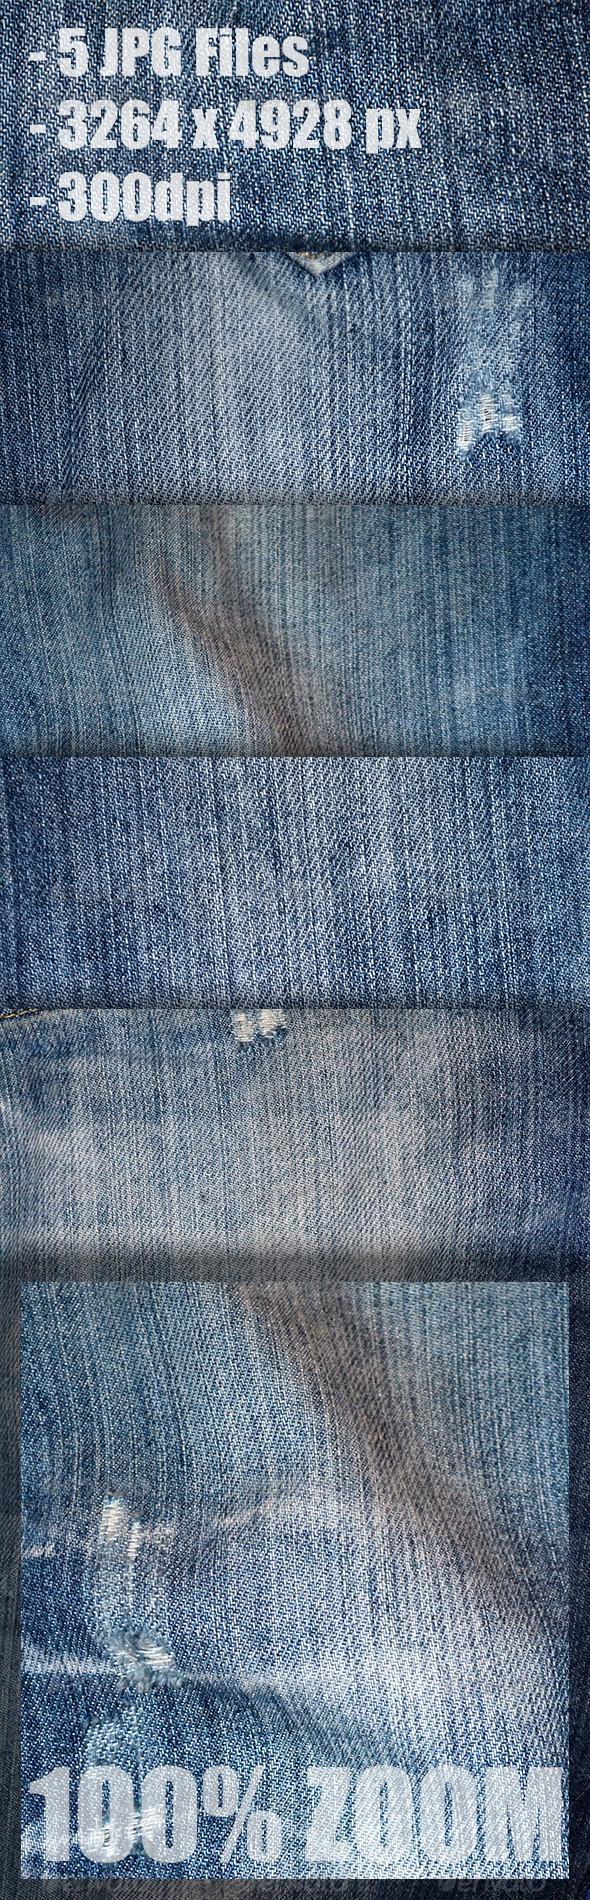 GraphicRiver 5 jeans textures 4484703